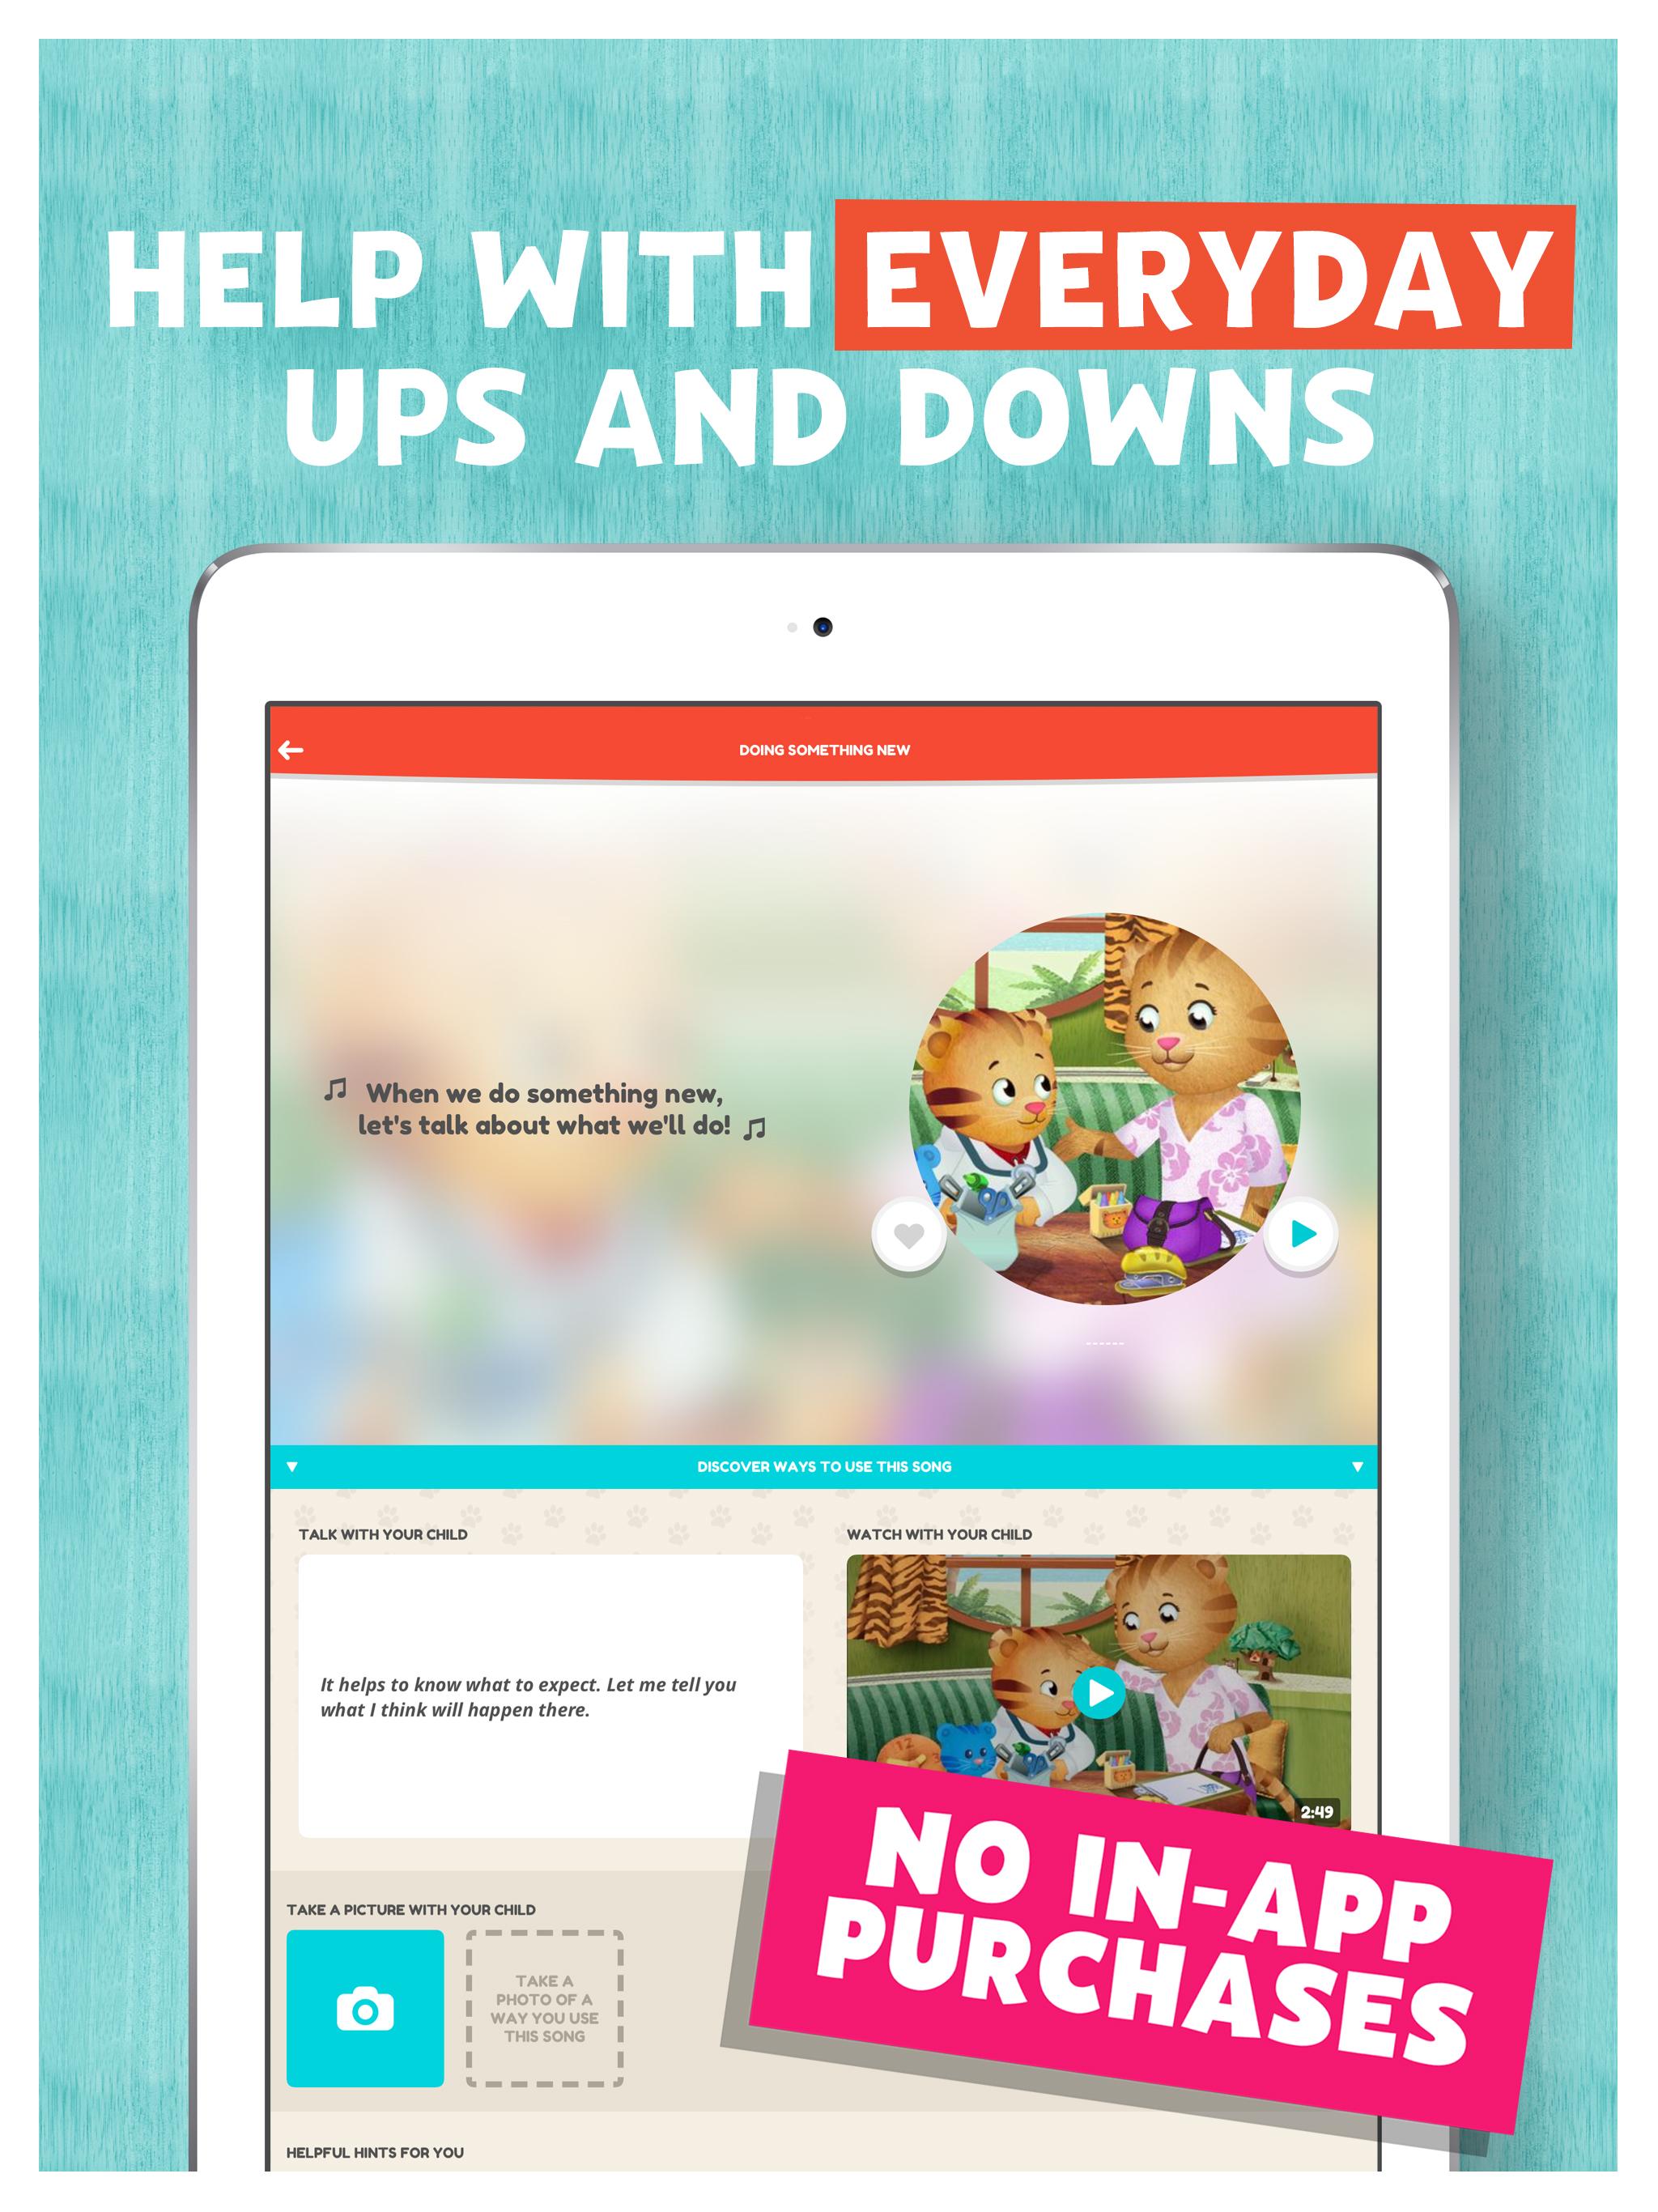 Daniel Tiger for Parents Mobile Downloads | PBS KIDS